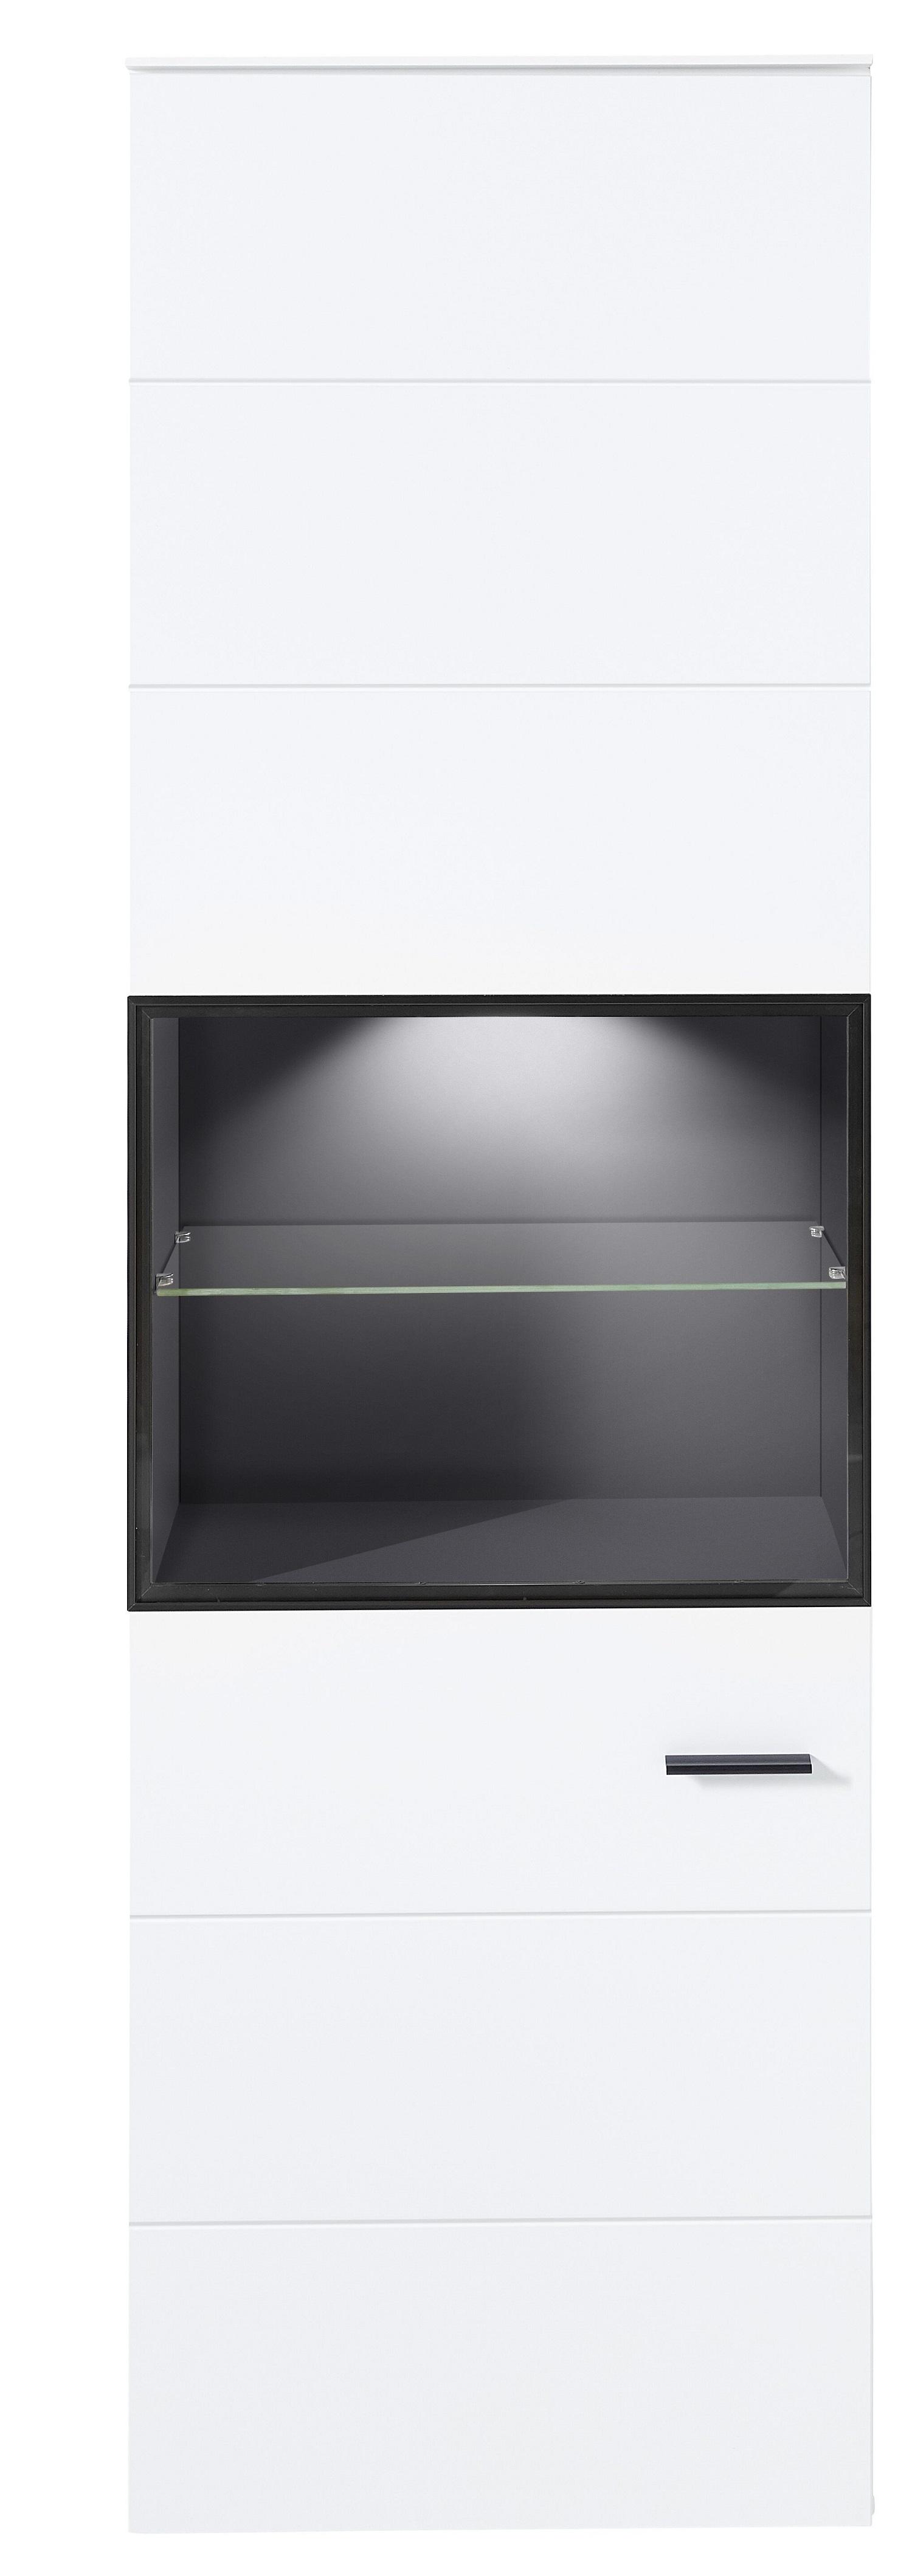 Vitrina din pal si MDF cu 1 usa, Madeline Alb / Grafit, l60xA36xH199 cm imagine